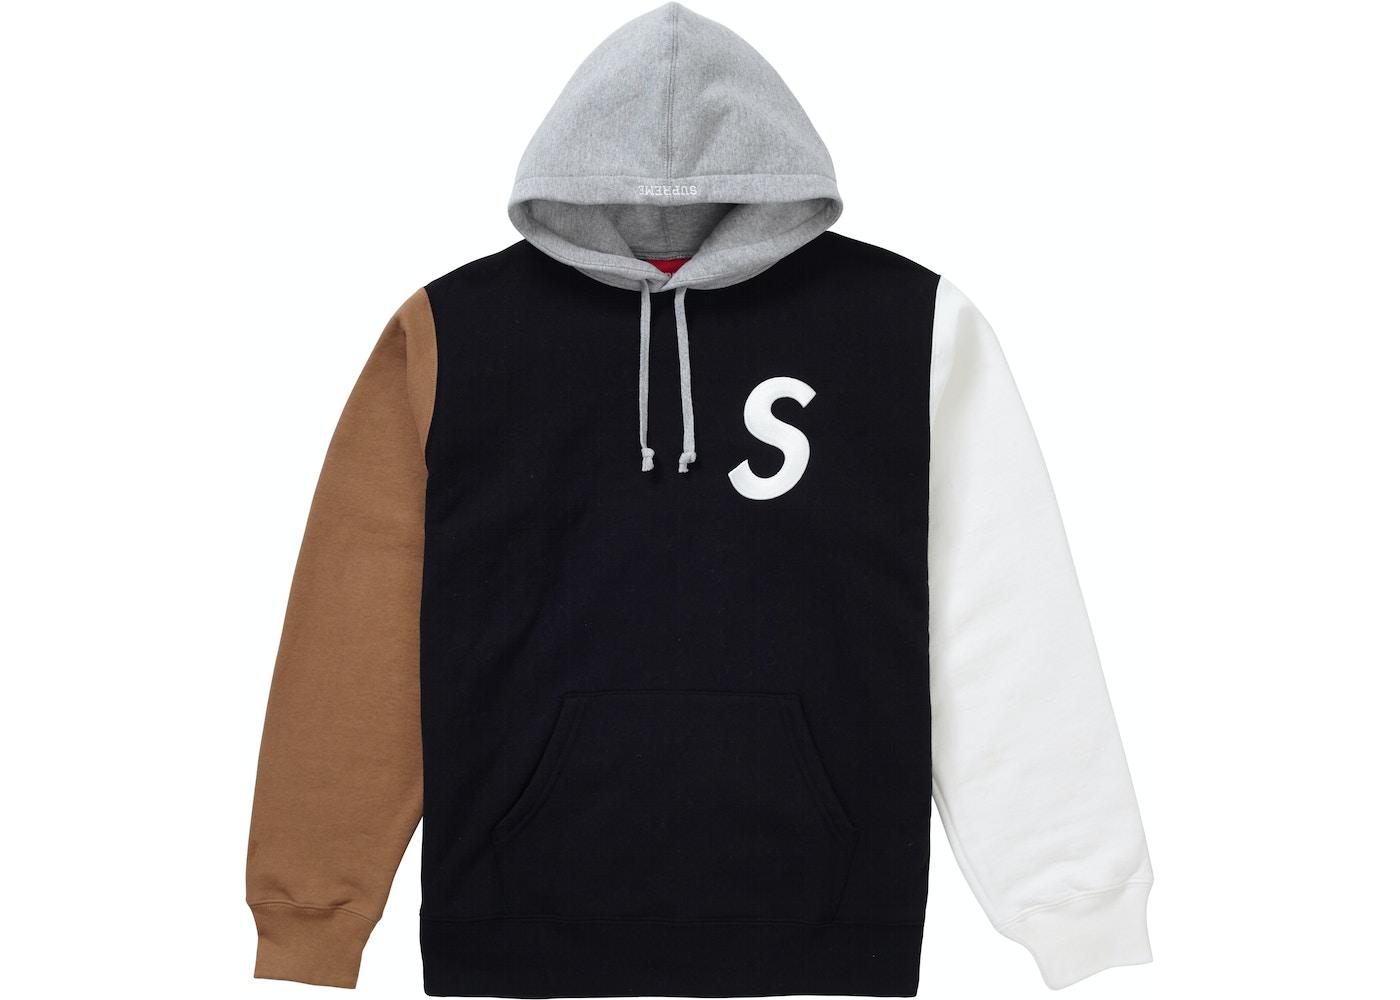 02a41f739645 Supreme Tops Sweatshirts - Buy   Sell Streetwear